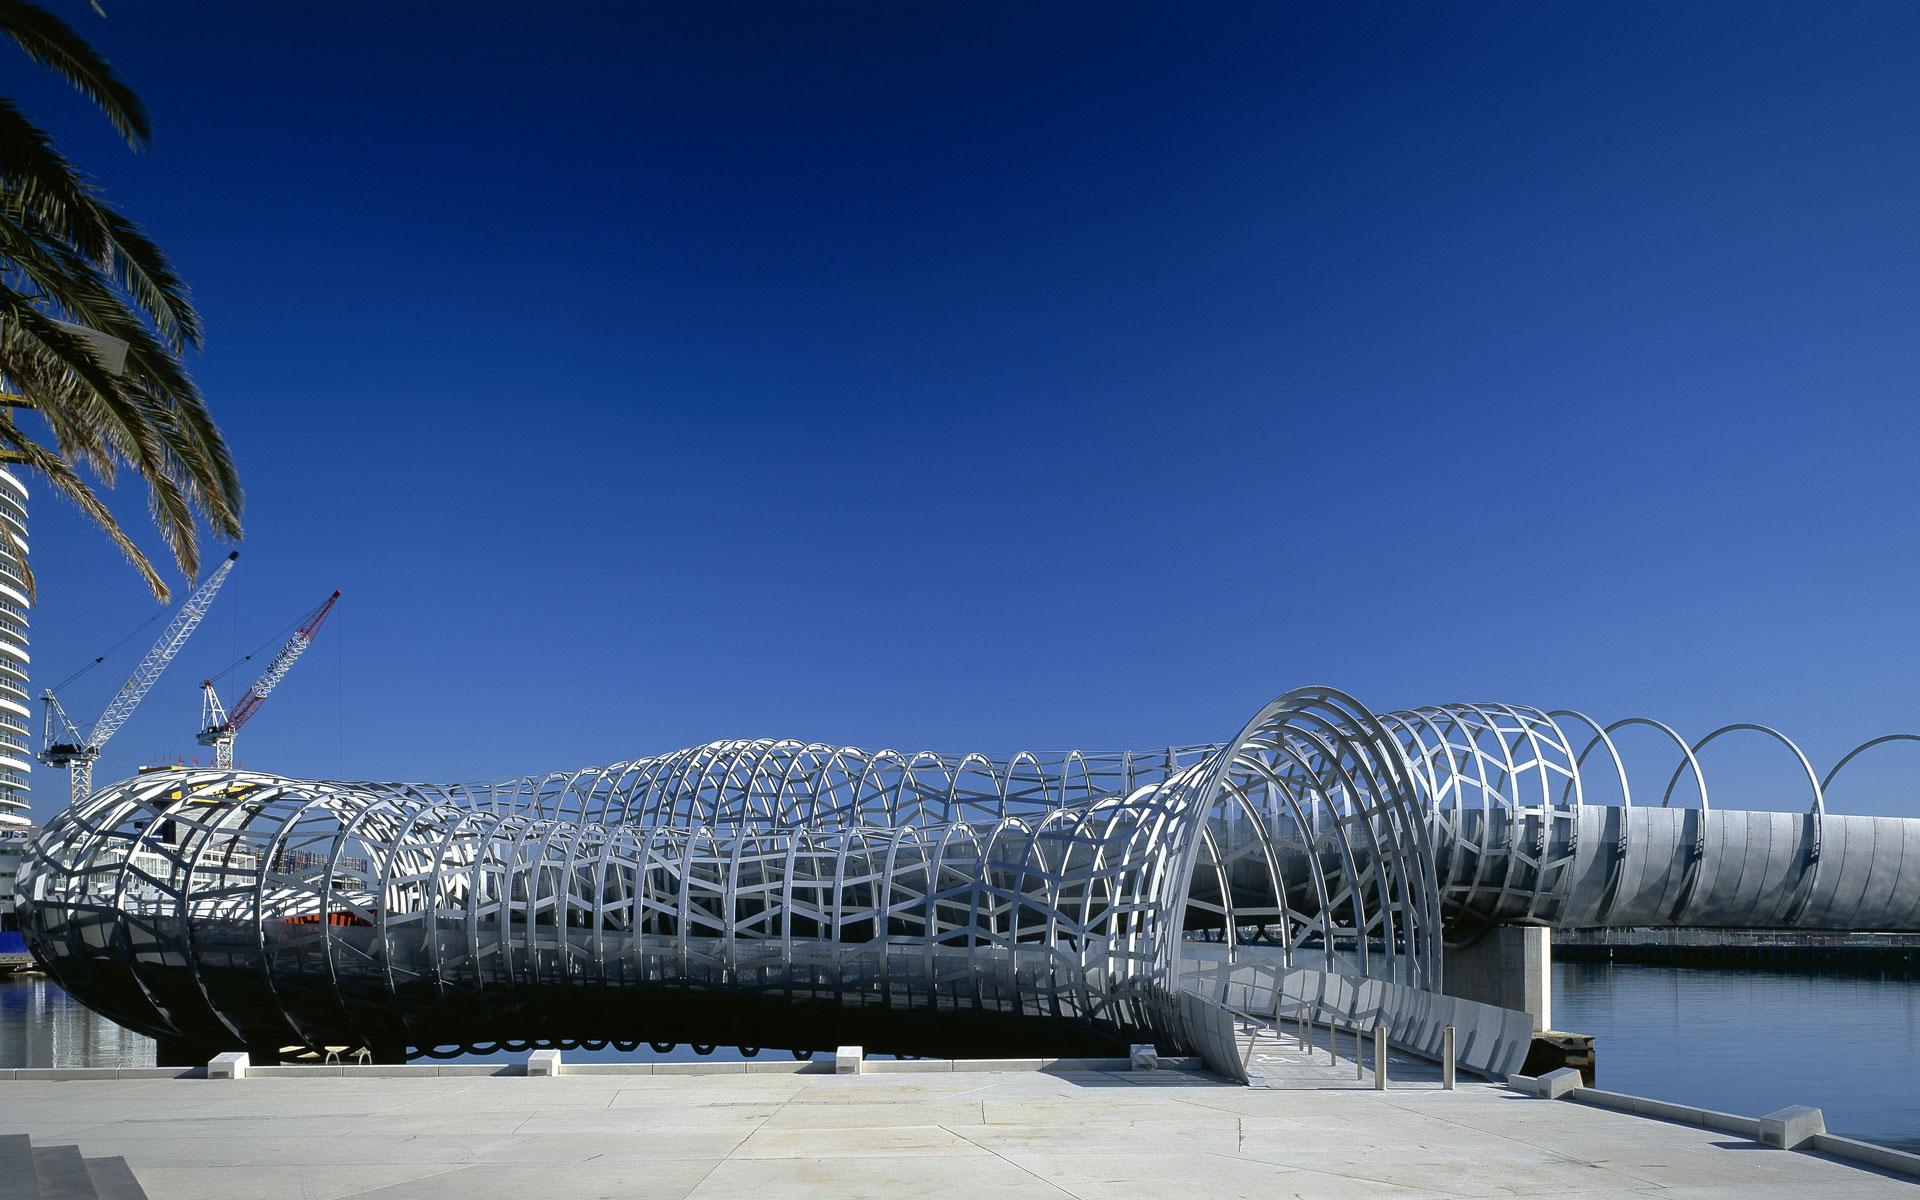 Webb Bridge, Melbourne, Australia